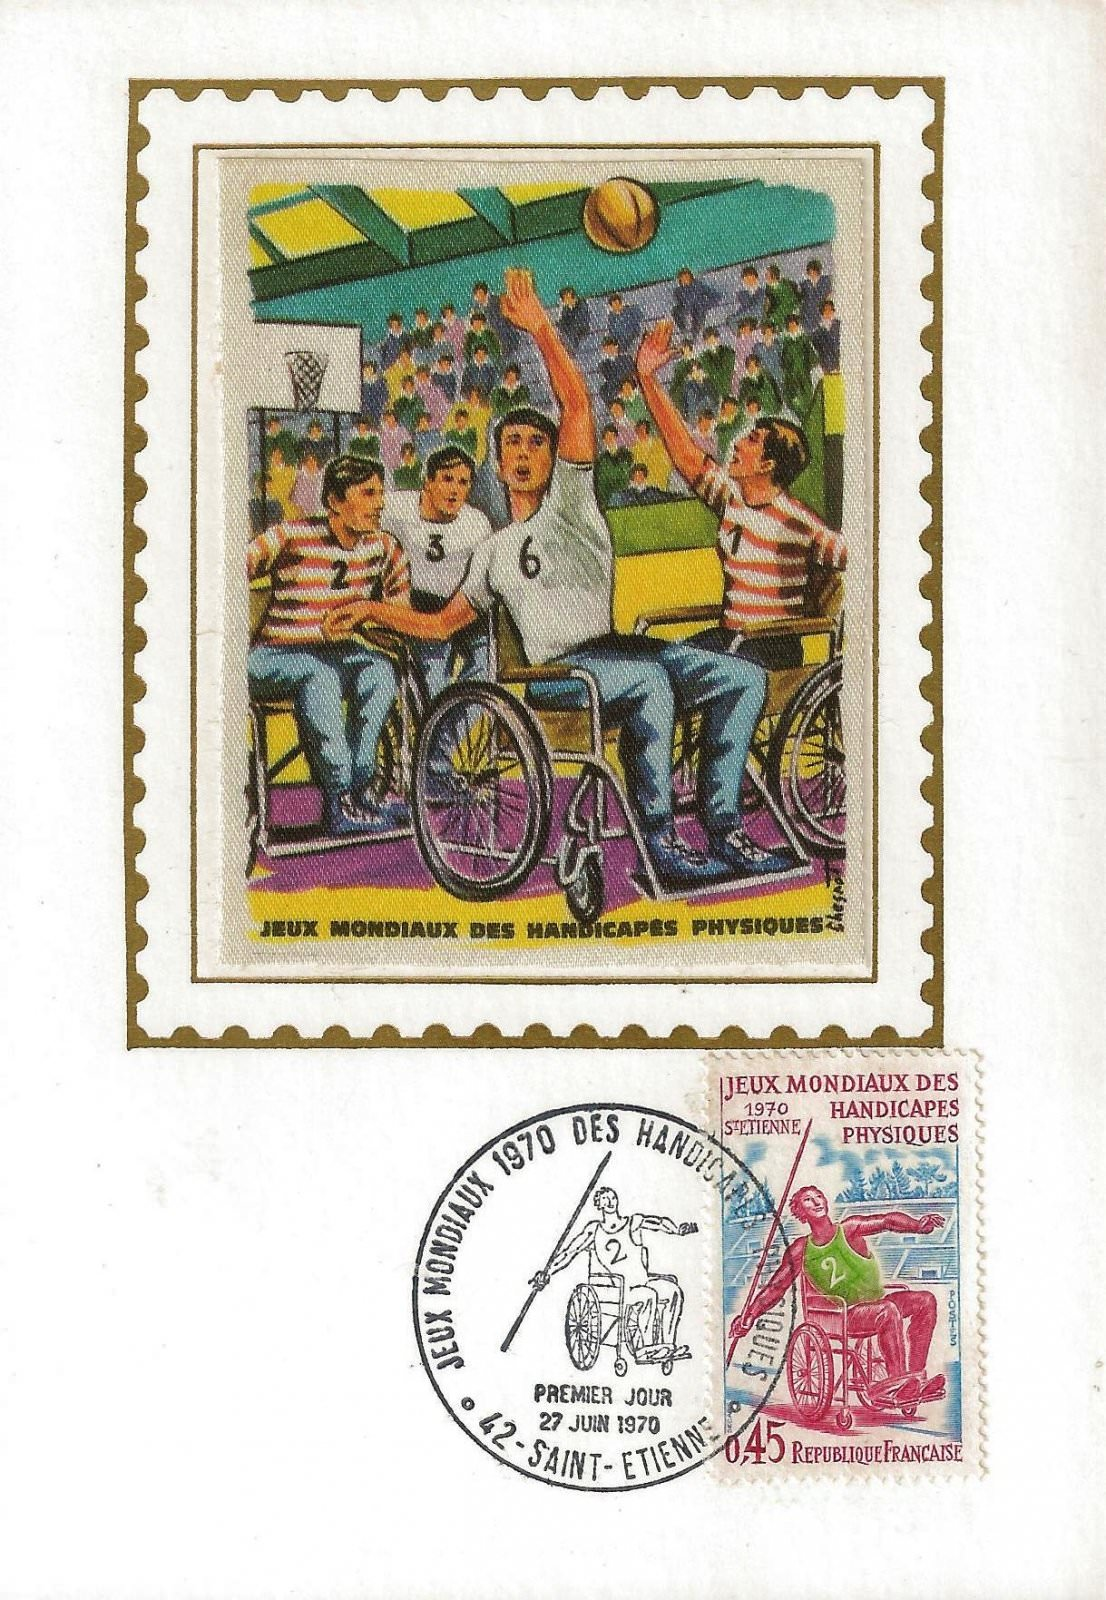 1970joHANDICAPES